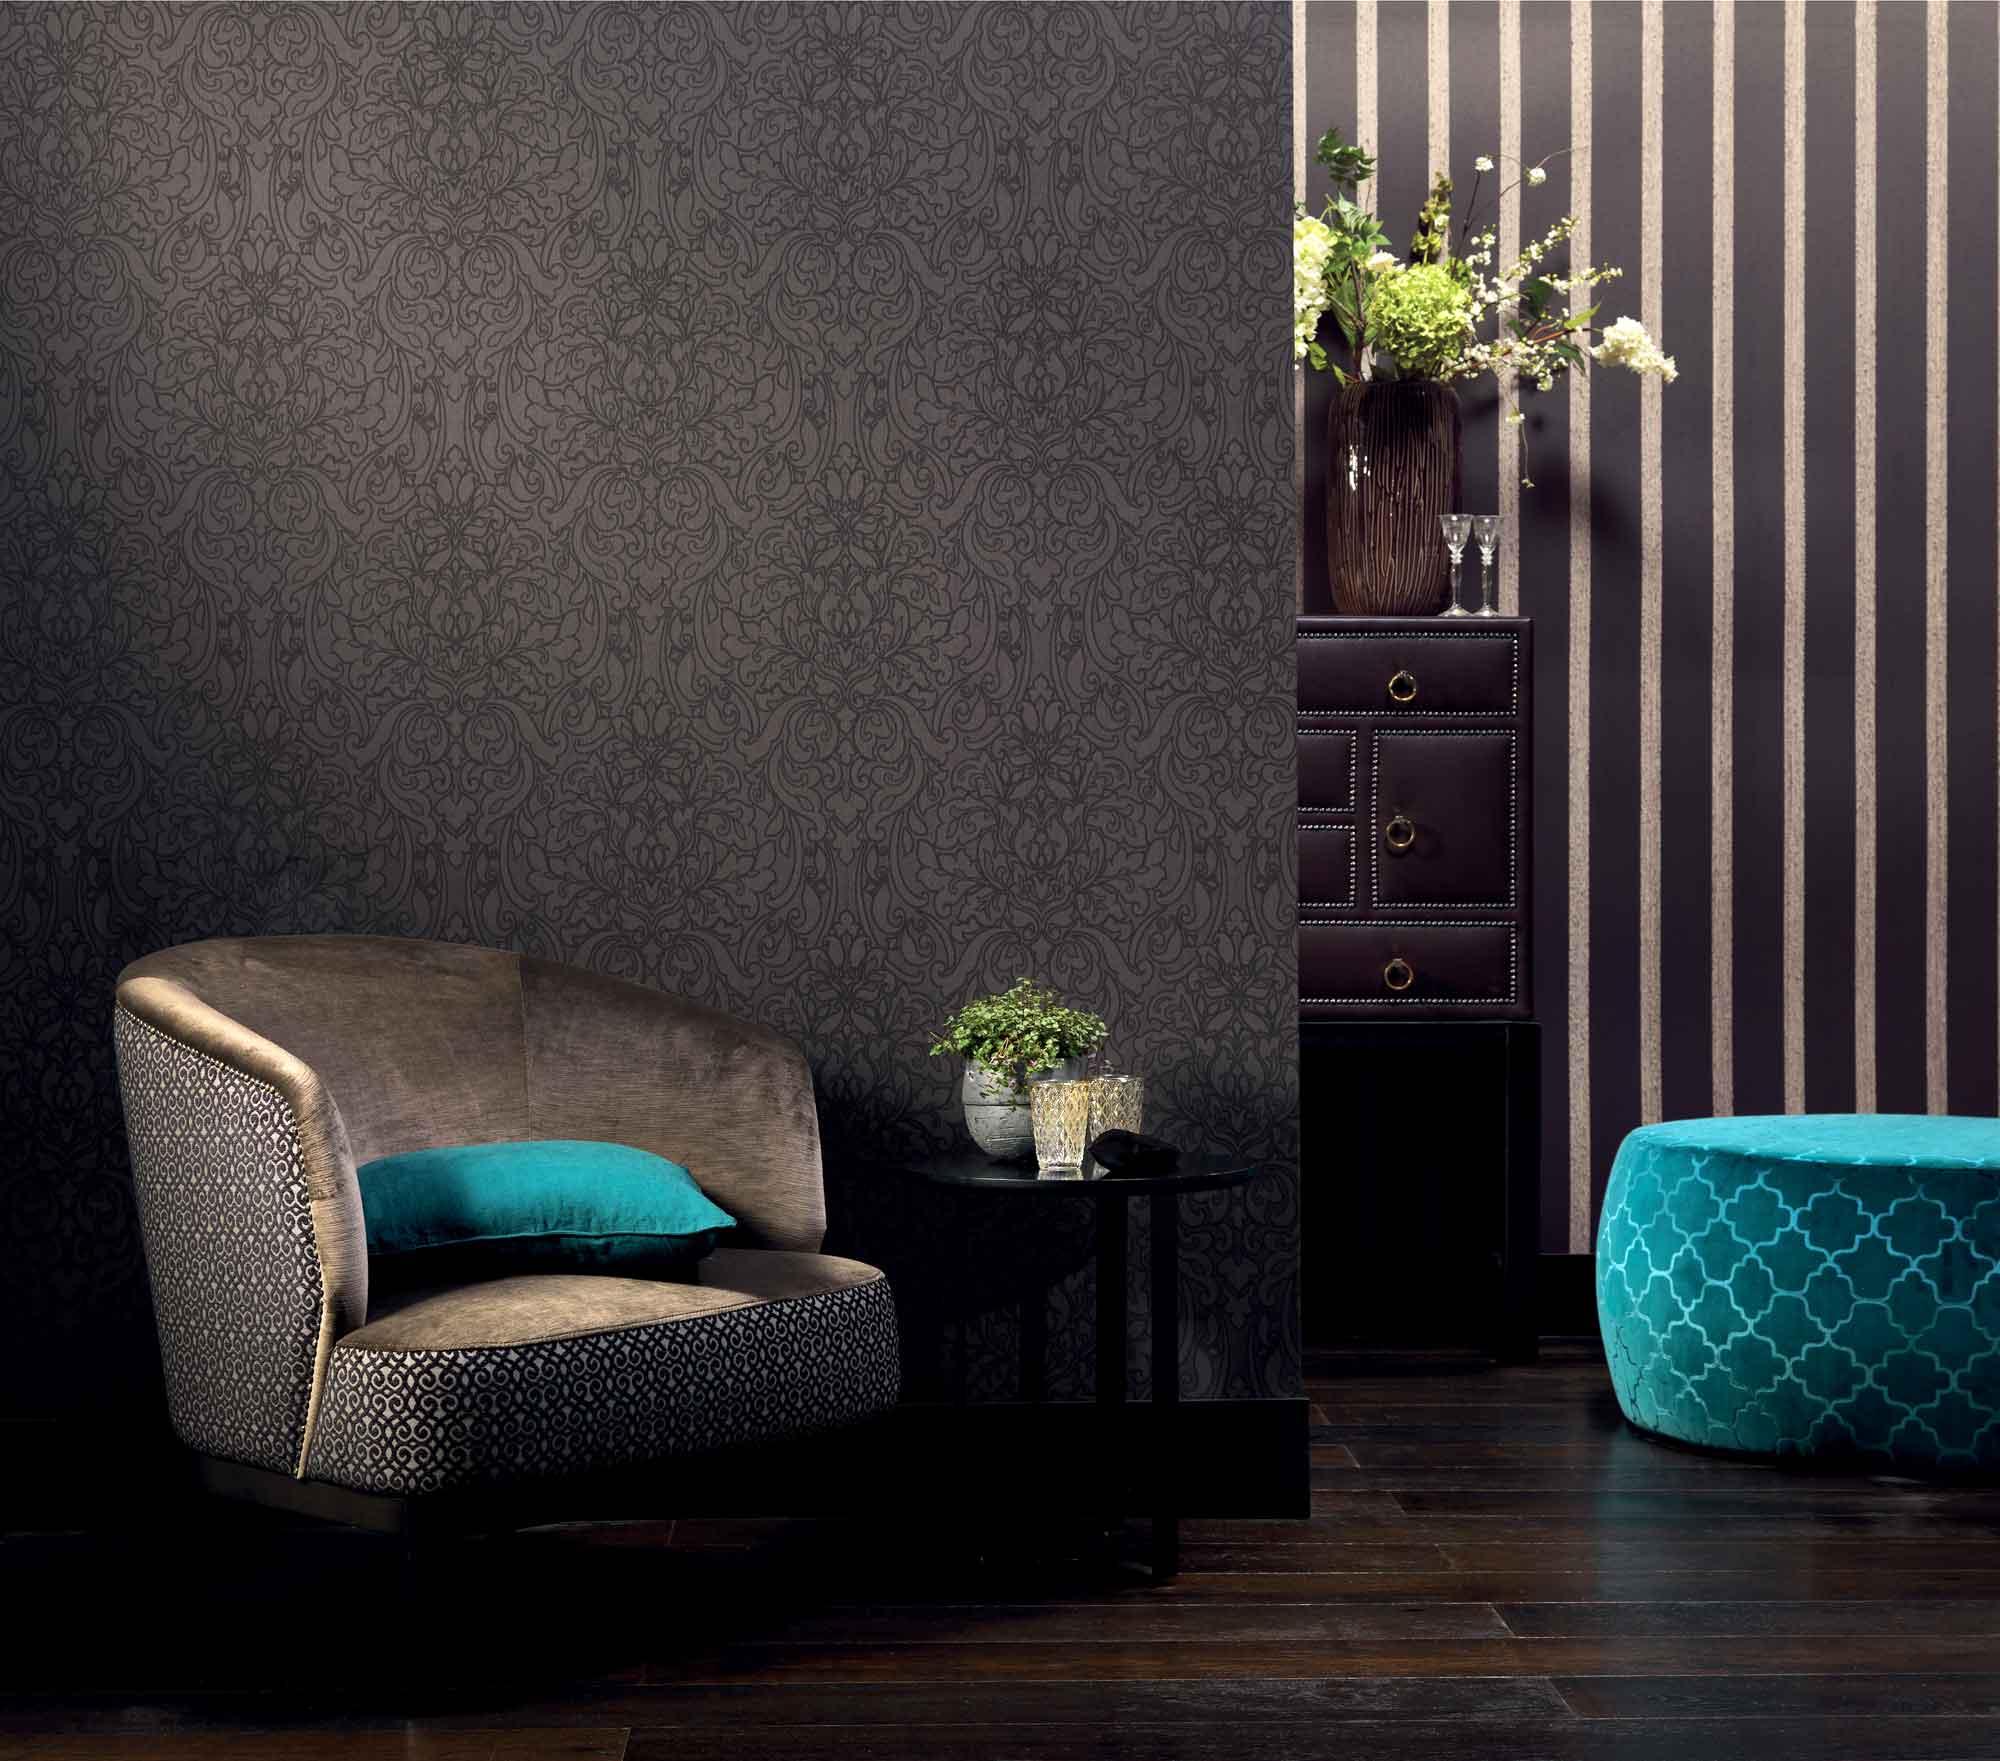 Design Tapeten Restposten : alles zu diesen Rasch textil Tapeten bei tapetenshop.mobi – shop 3